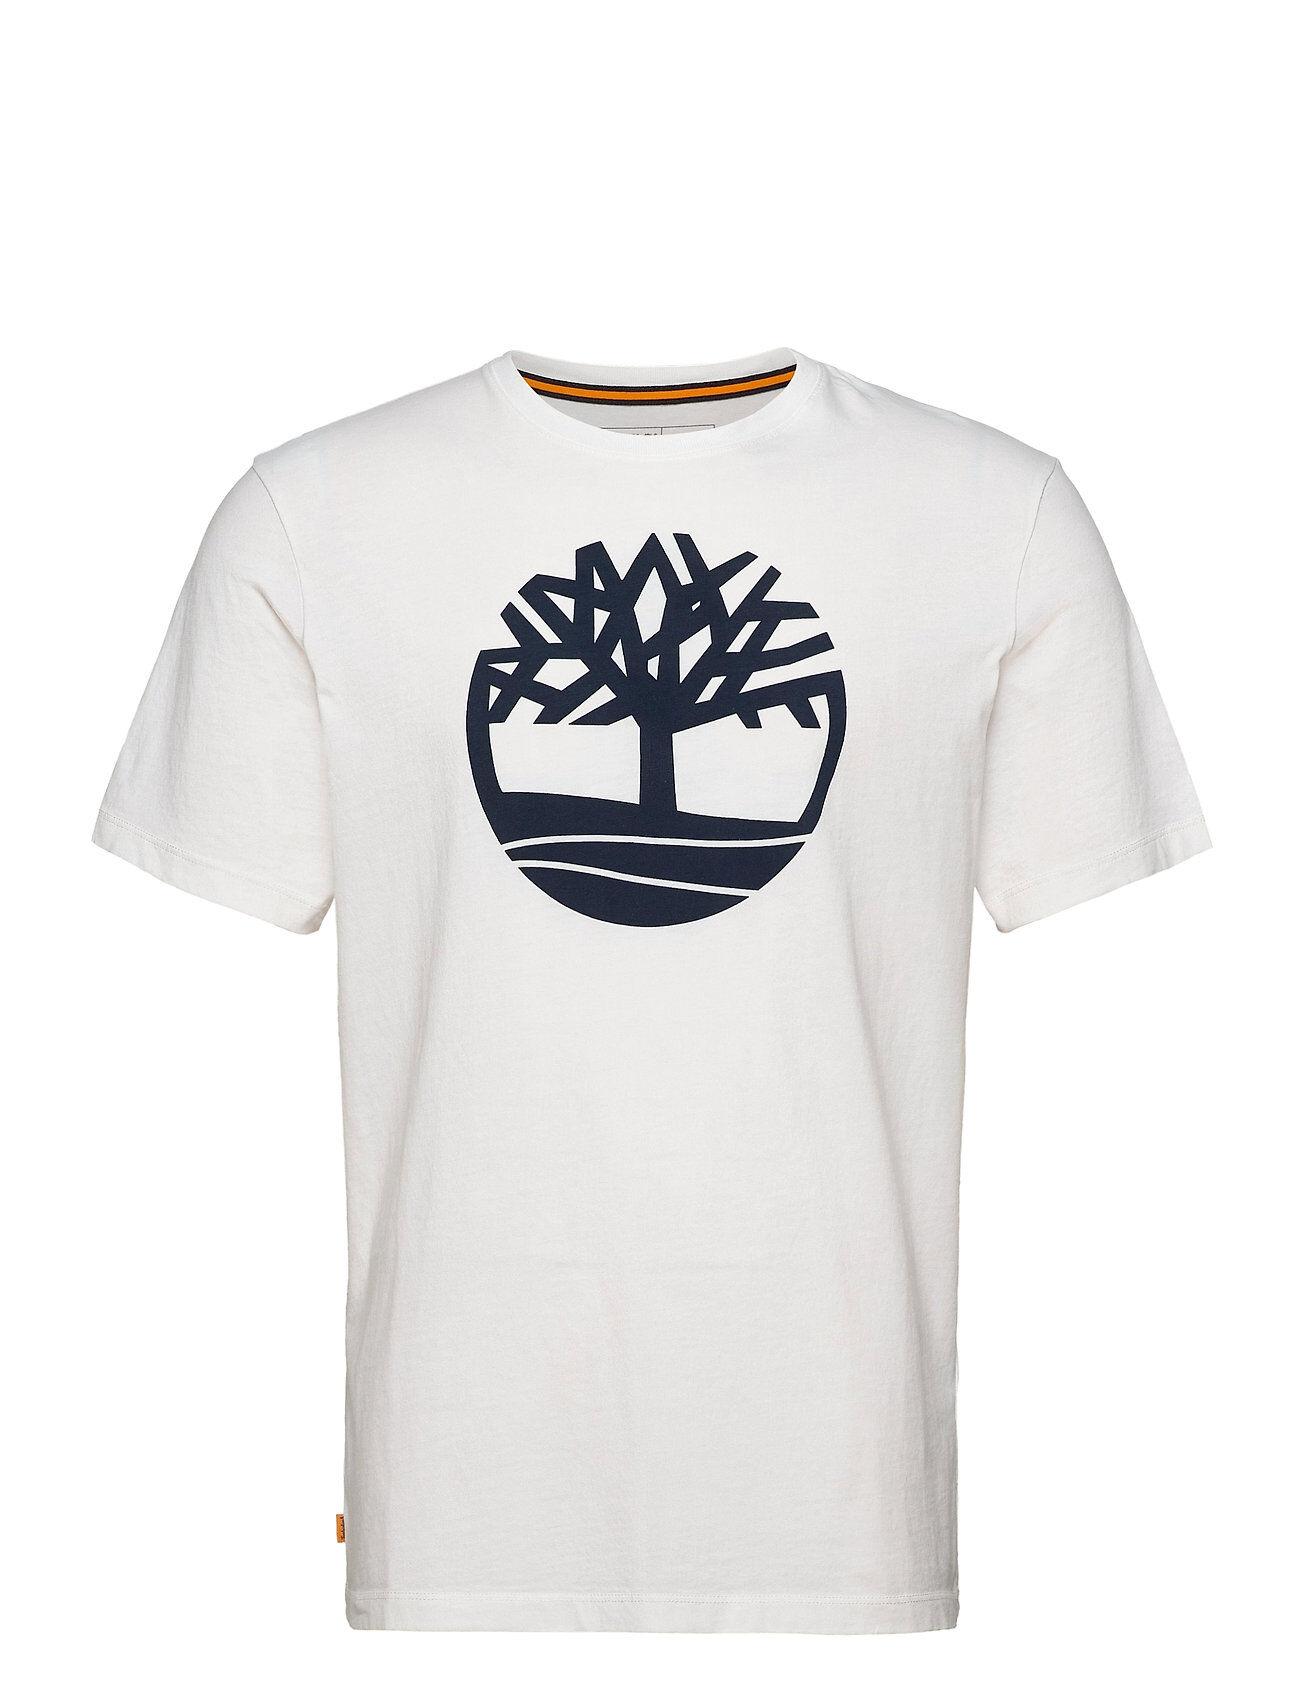 Timberland Ss K-R Brand Tree T T-shirts Short-sleeved Valkoinen Timberland